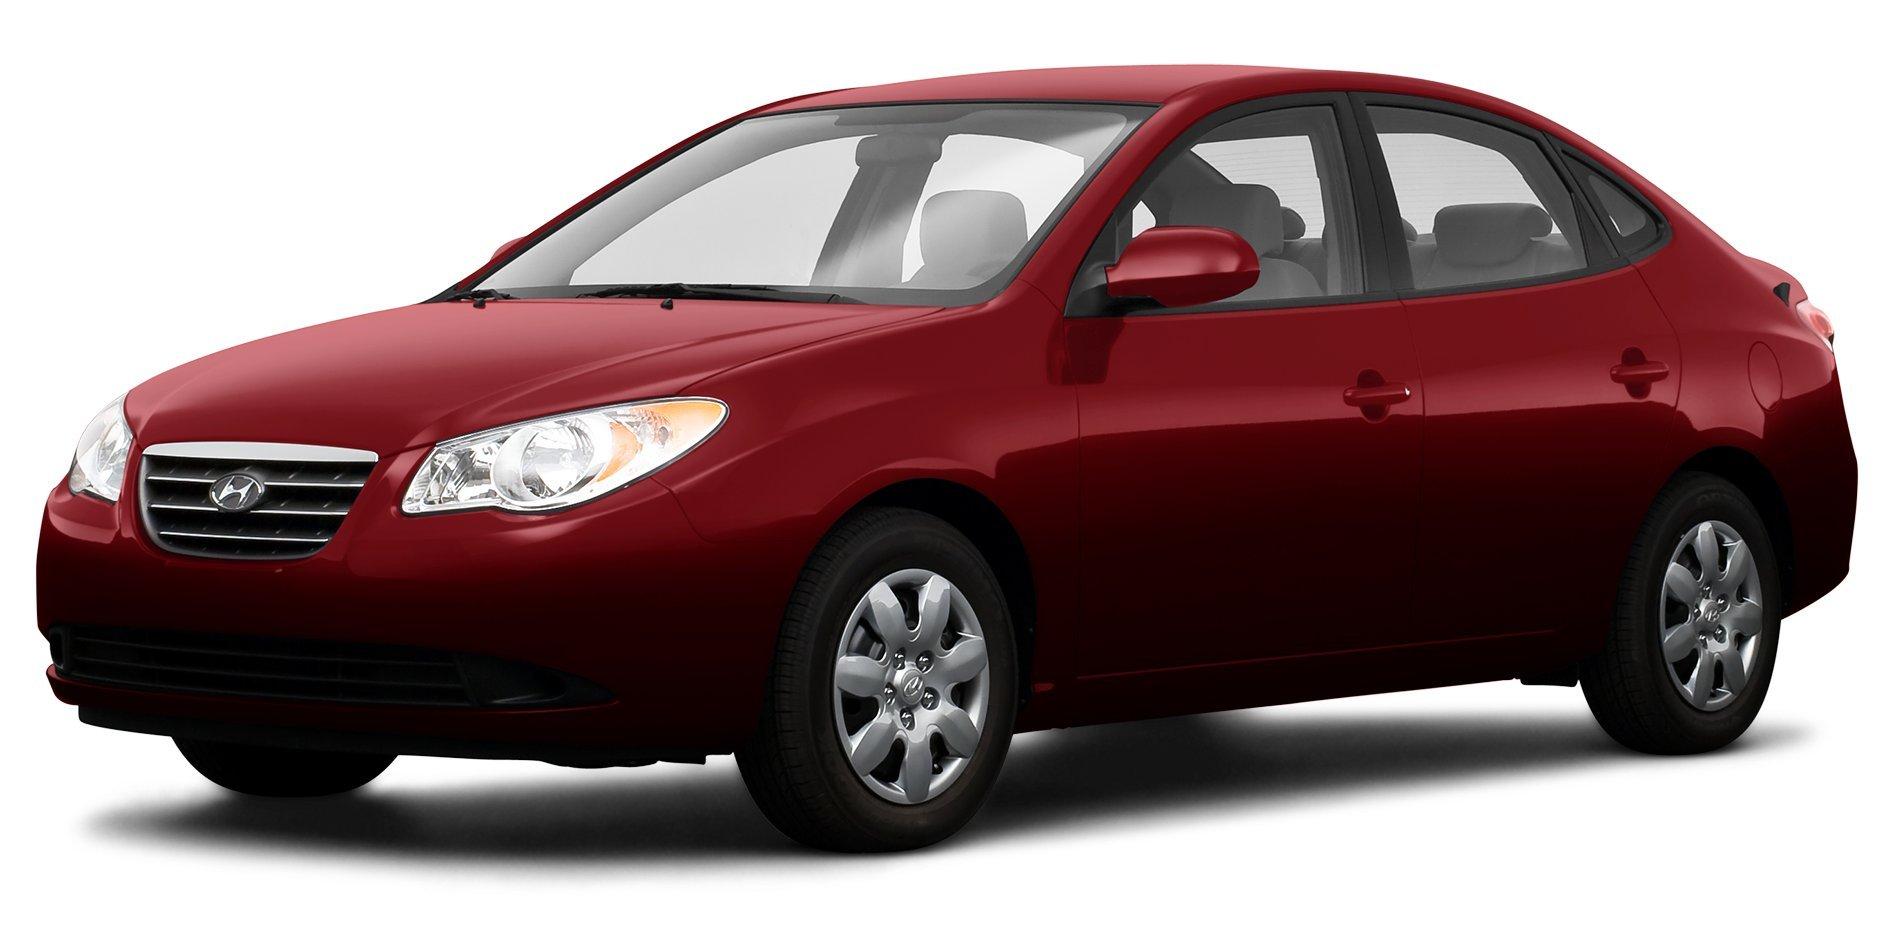 2009 Hyundai Elantra GLS, 4-Door Sedan Automatic Transmission ...